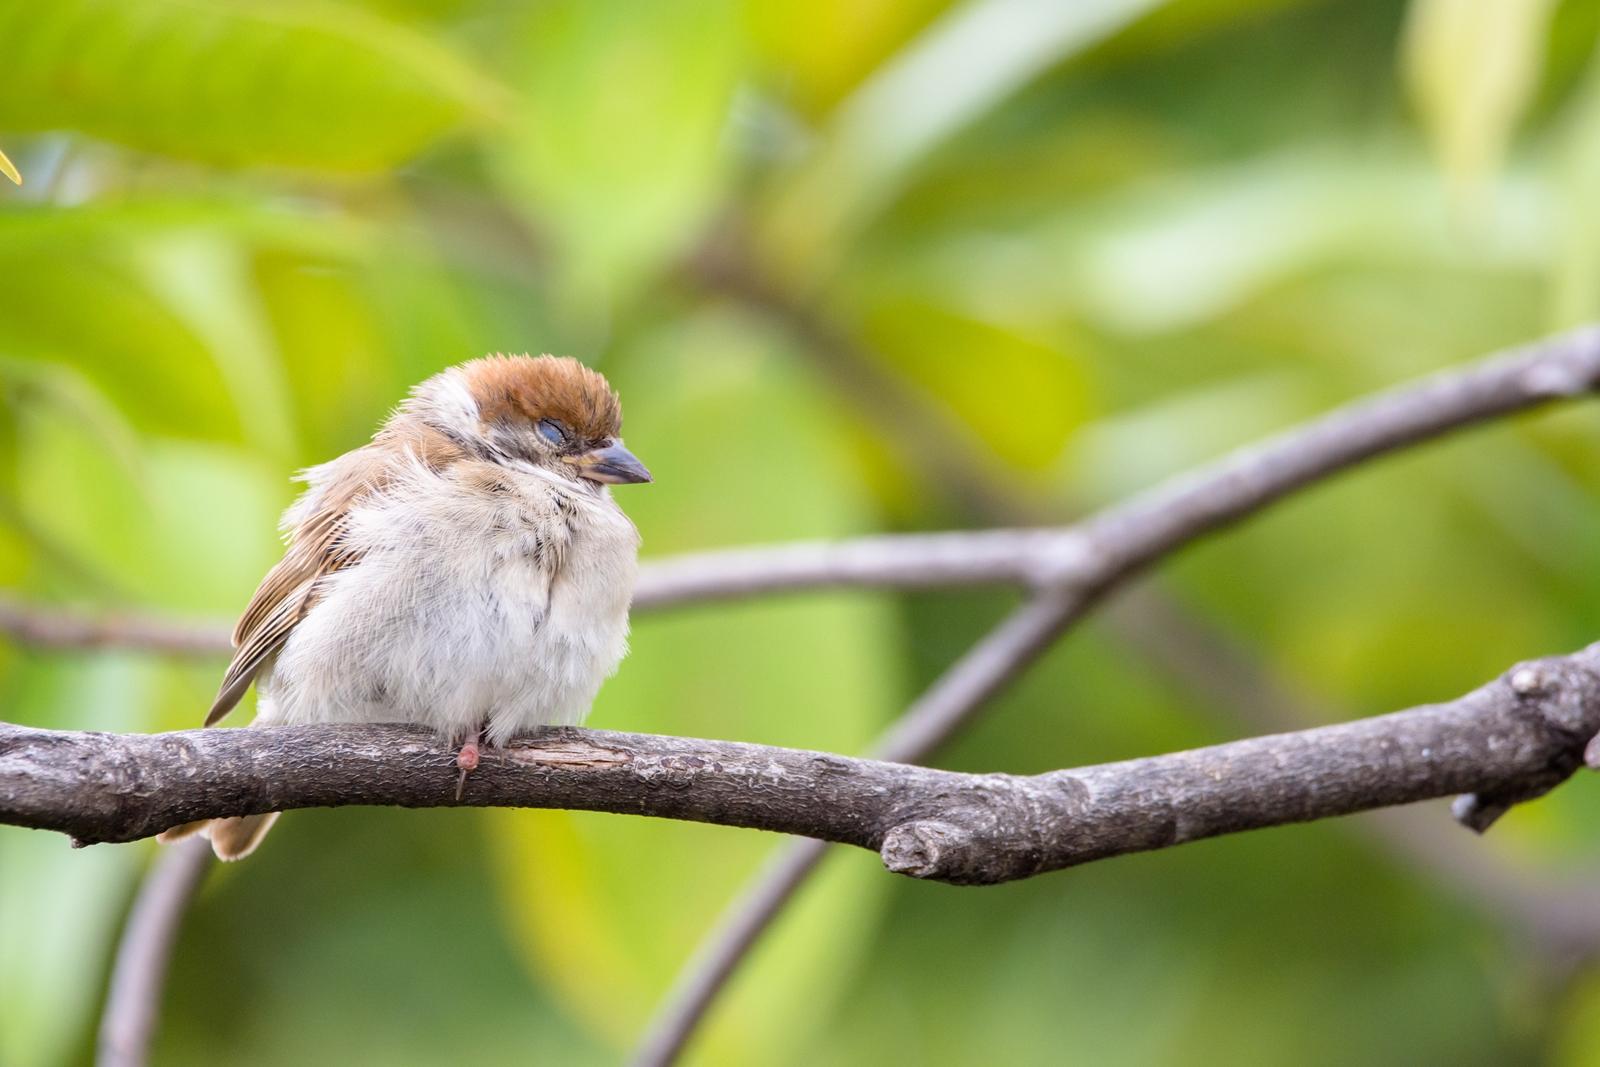 Photo: ねむねむ Sleepy.  気がつけば いつの間にやら夢の中 うつらうつら のんびり流れる昼下がり  Sparrow. (雀)  #GplusPhotoWalkJapan #Gplus4YearsAnniversary #Gplus4yearPW_Kanto #birdphotography #birds #cooljapan #kawaii #nikon #sigma  Nikon D7200 SIGMA 150-600mm F5-6.3 DG OS HSM Contemporary  ・小鳥の詩朗読 /poetry reading https://youtu.be/ZtcohW5GHek?list=PL2YtHGm0-R3qVsaqvQe9OYdJFCkI98wzF